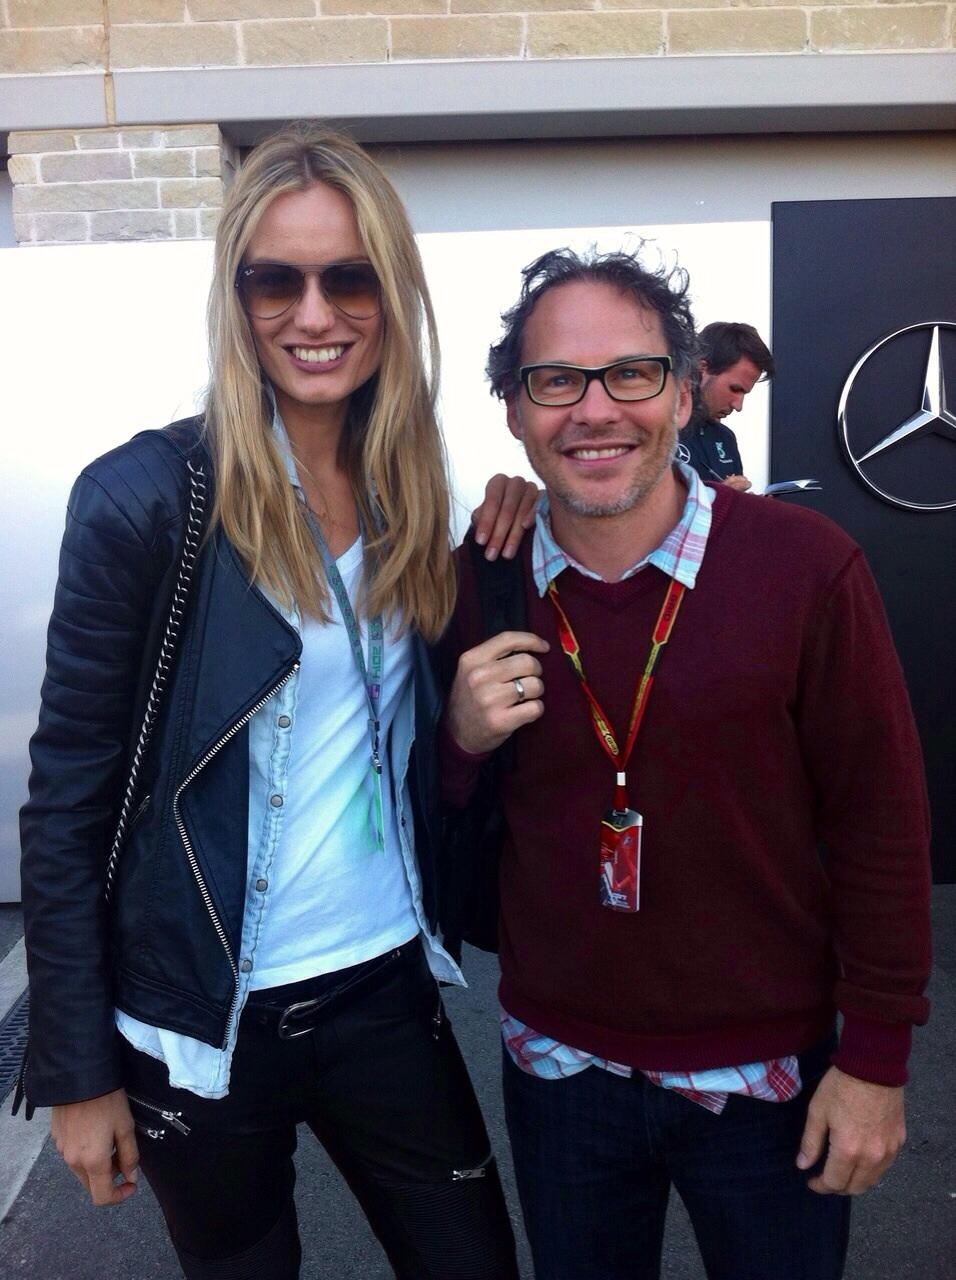 """I still remember watching him racing! Avec Jacques Villeneuve ;-)"""